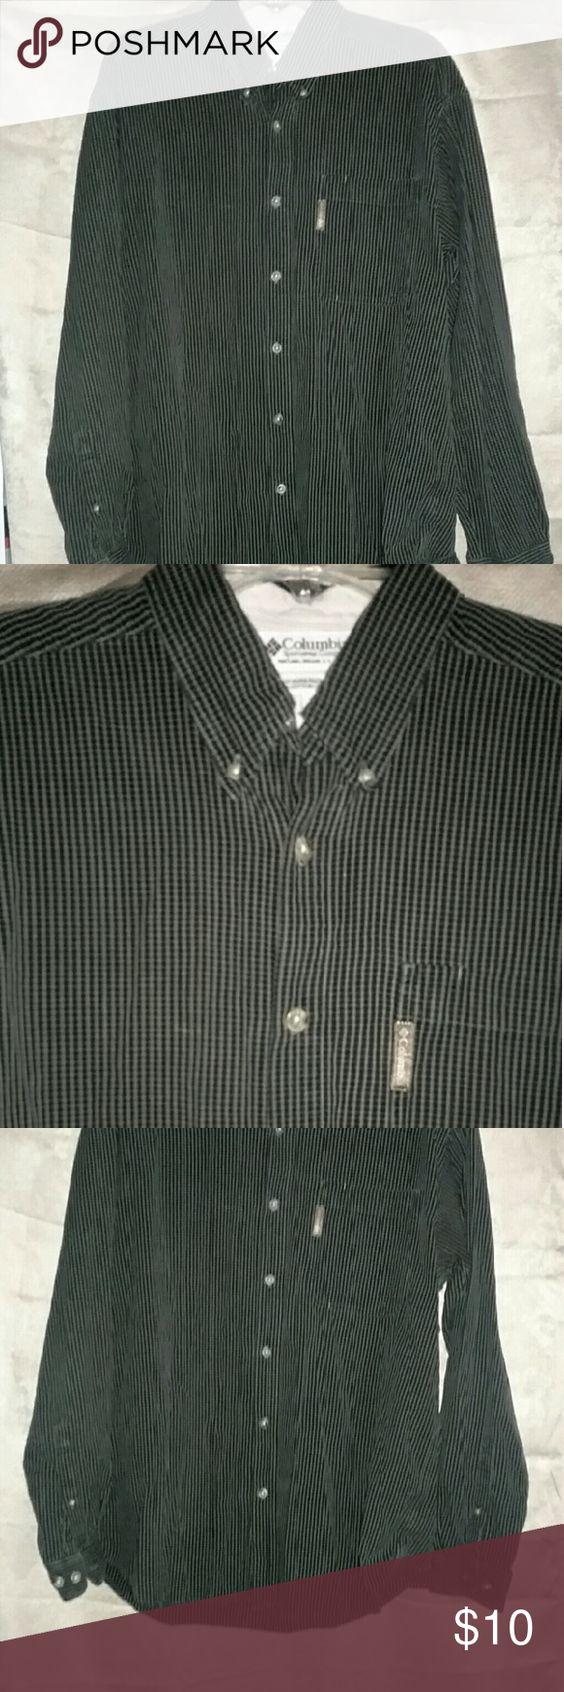 Columbia Sportswear Company Men's Shirt 100% cotton  great condition Columbia Shirts Dress Shirts